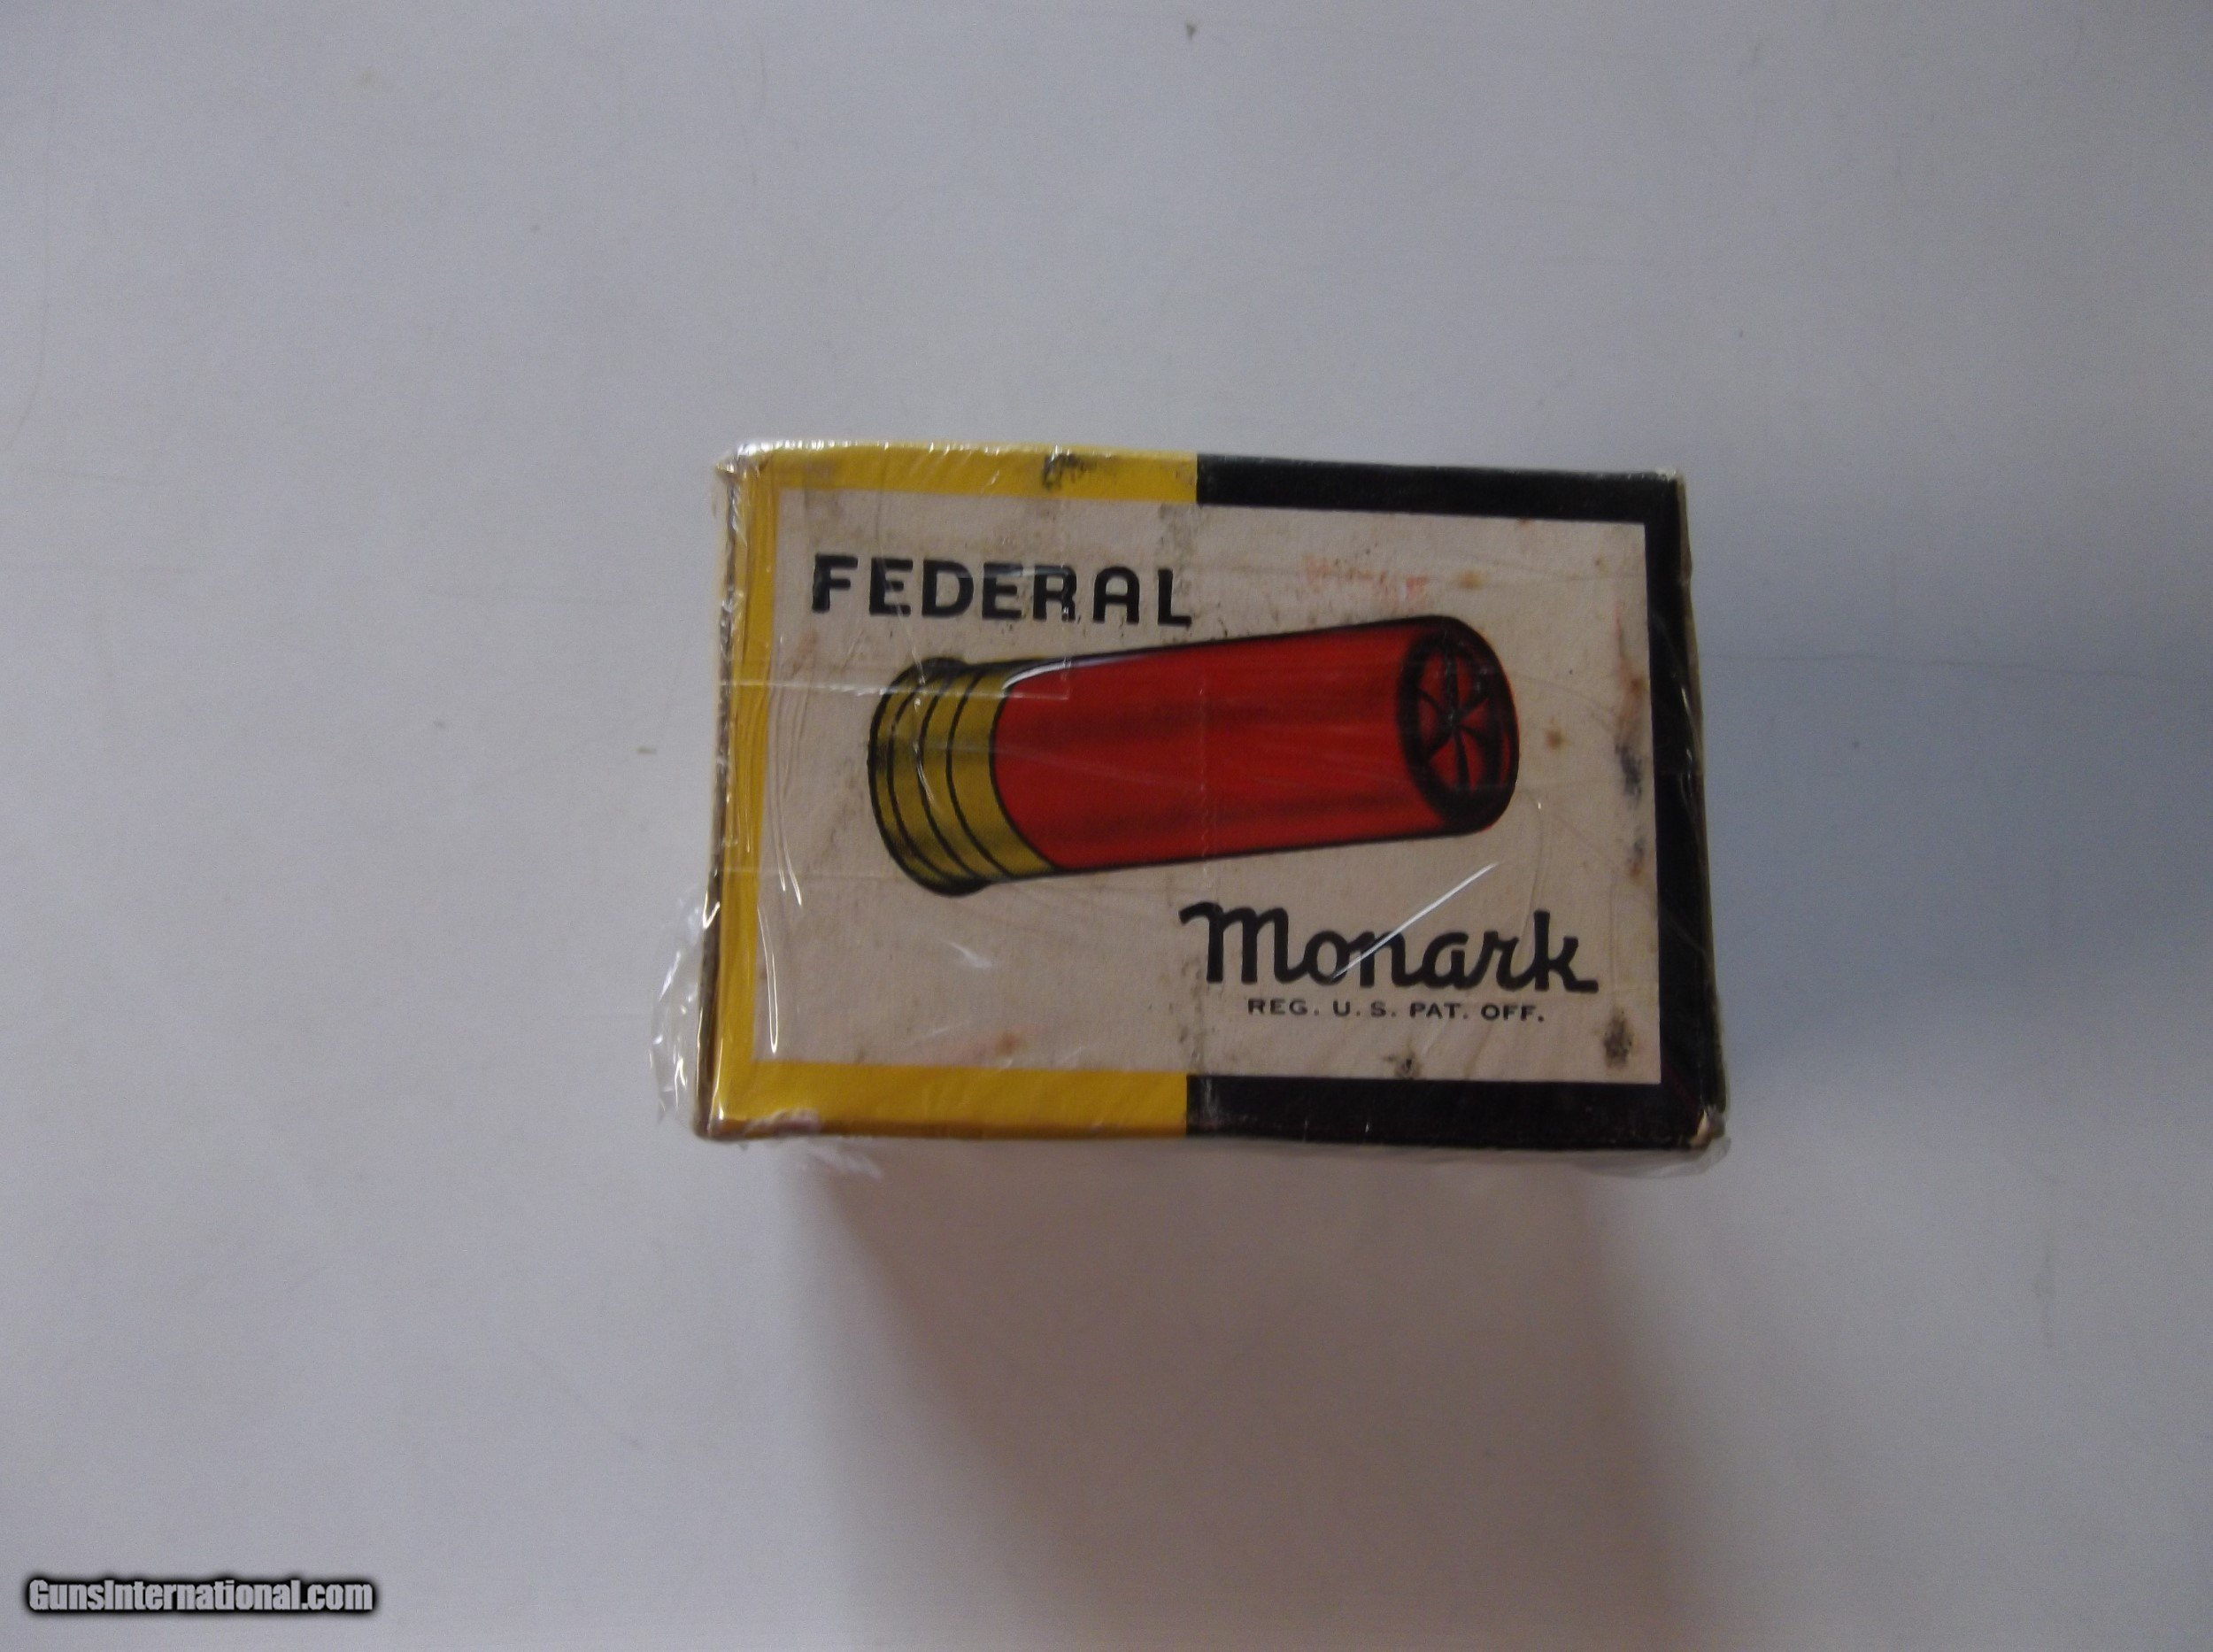 20 Ga Federal Monark Paper Target Load Shot Shells